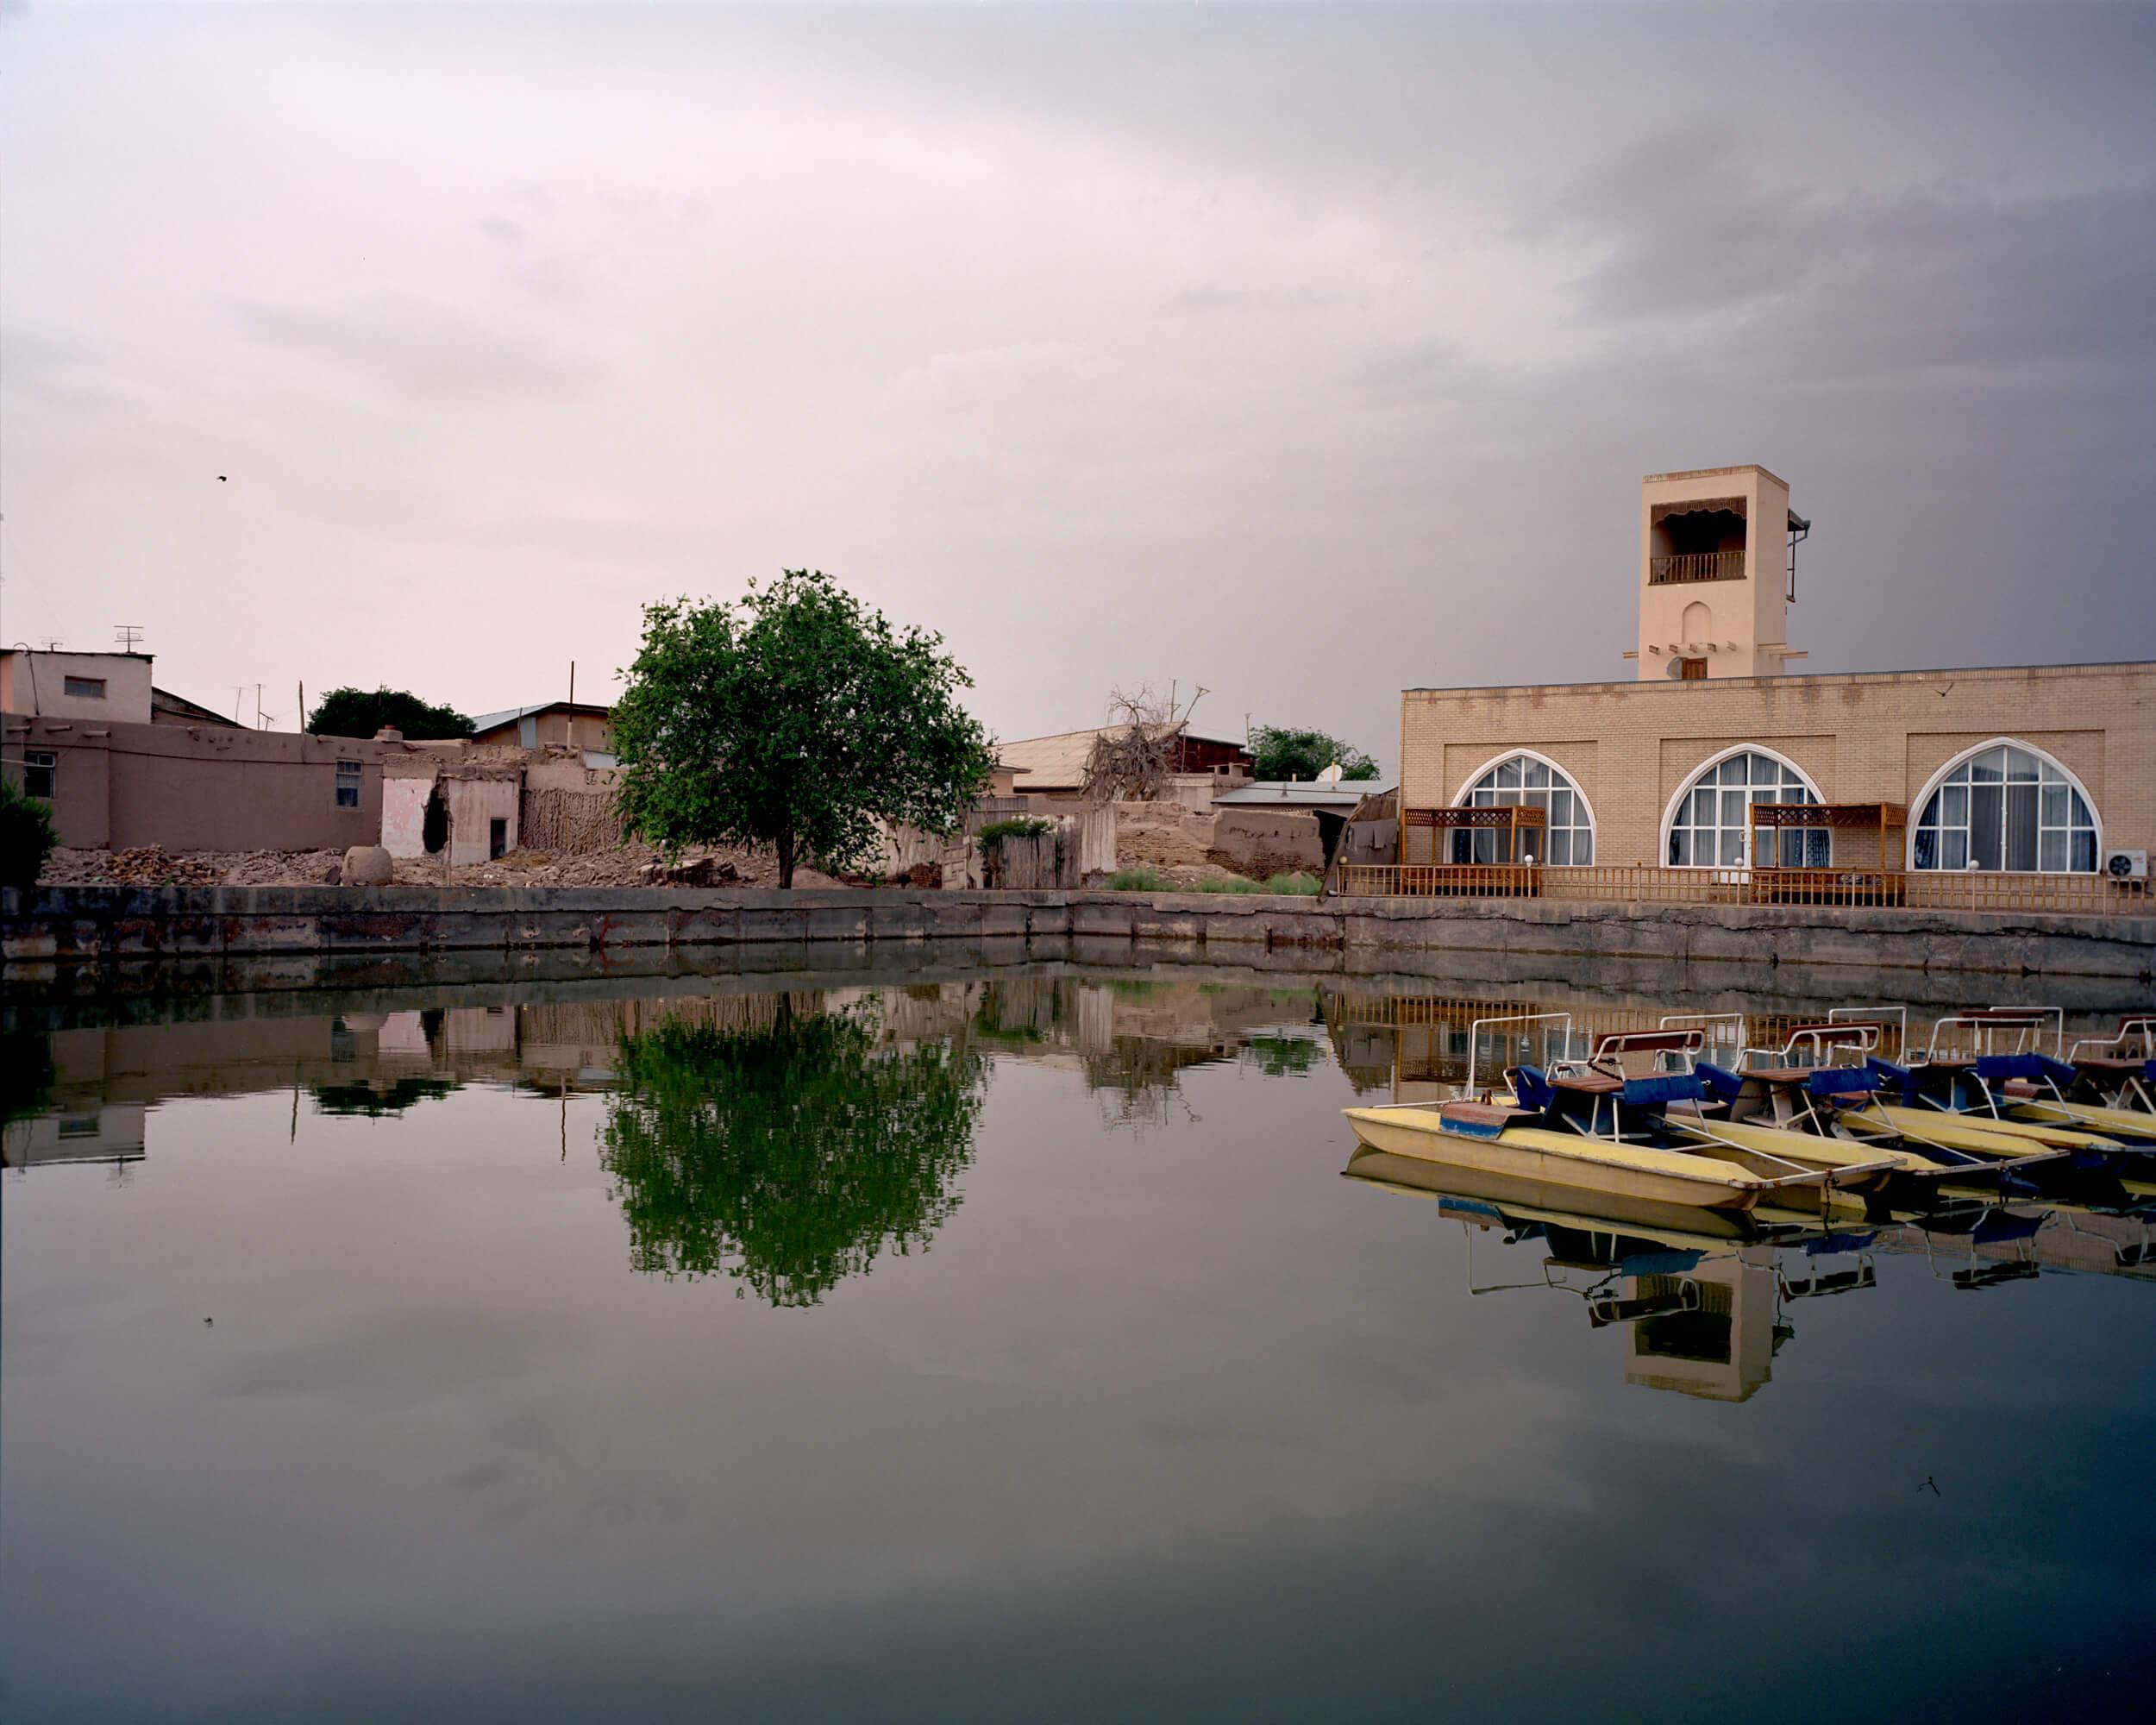 marco-barbieri-water-in-the-desert-41.jpg